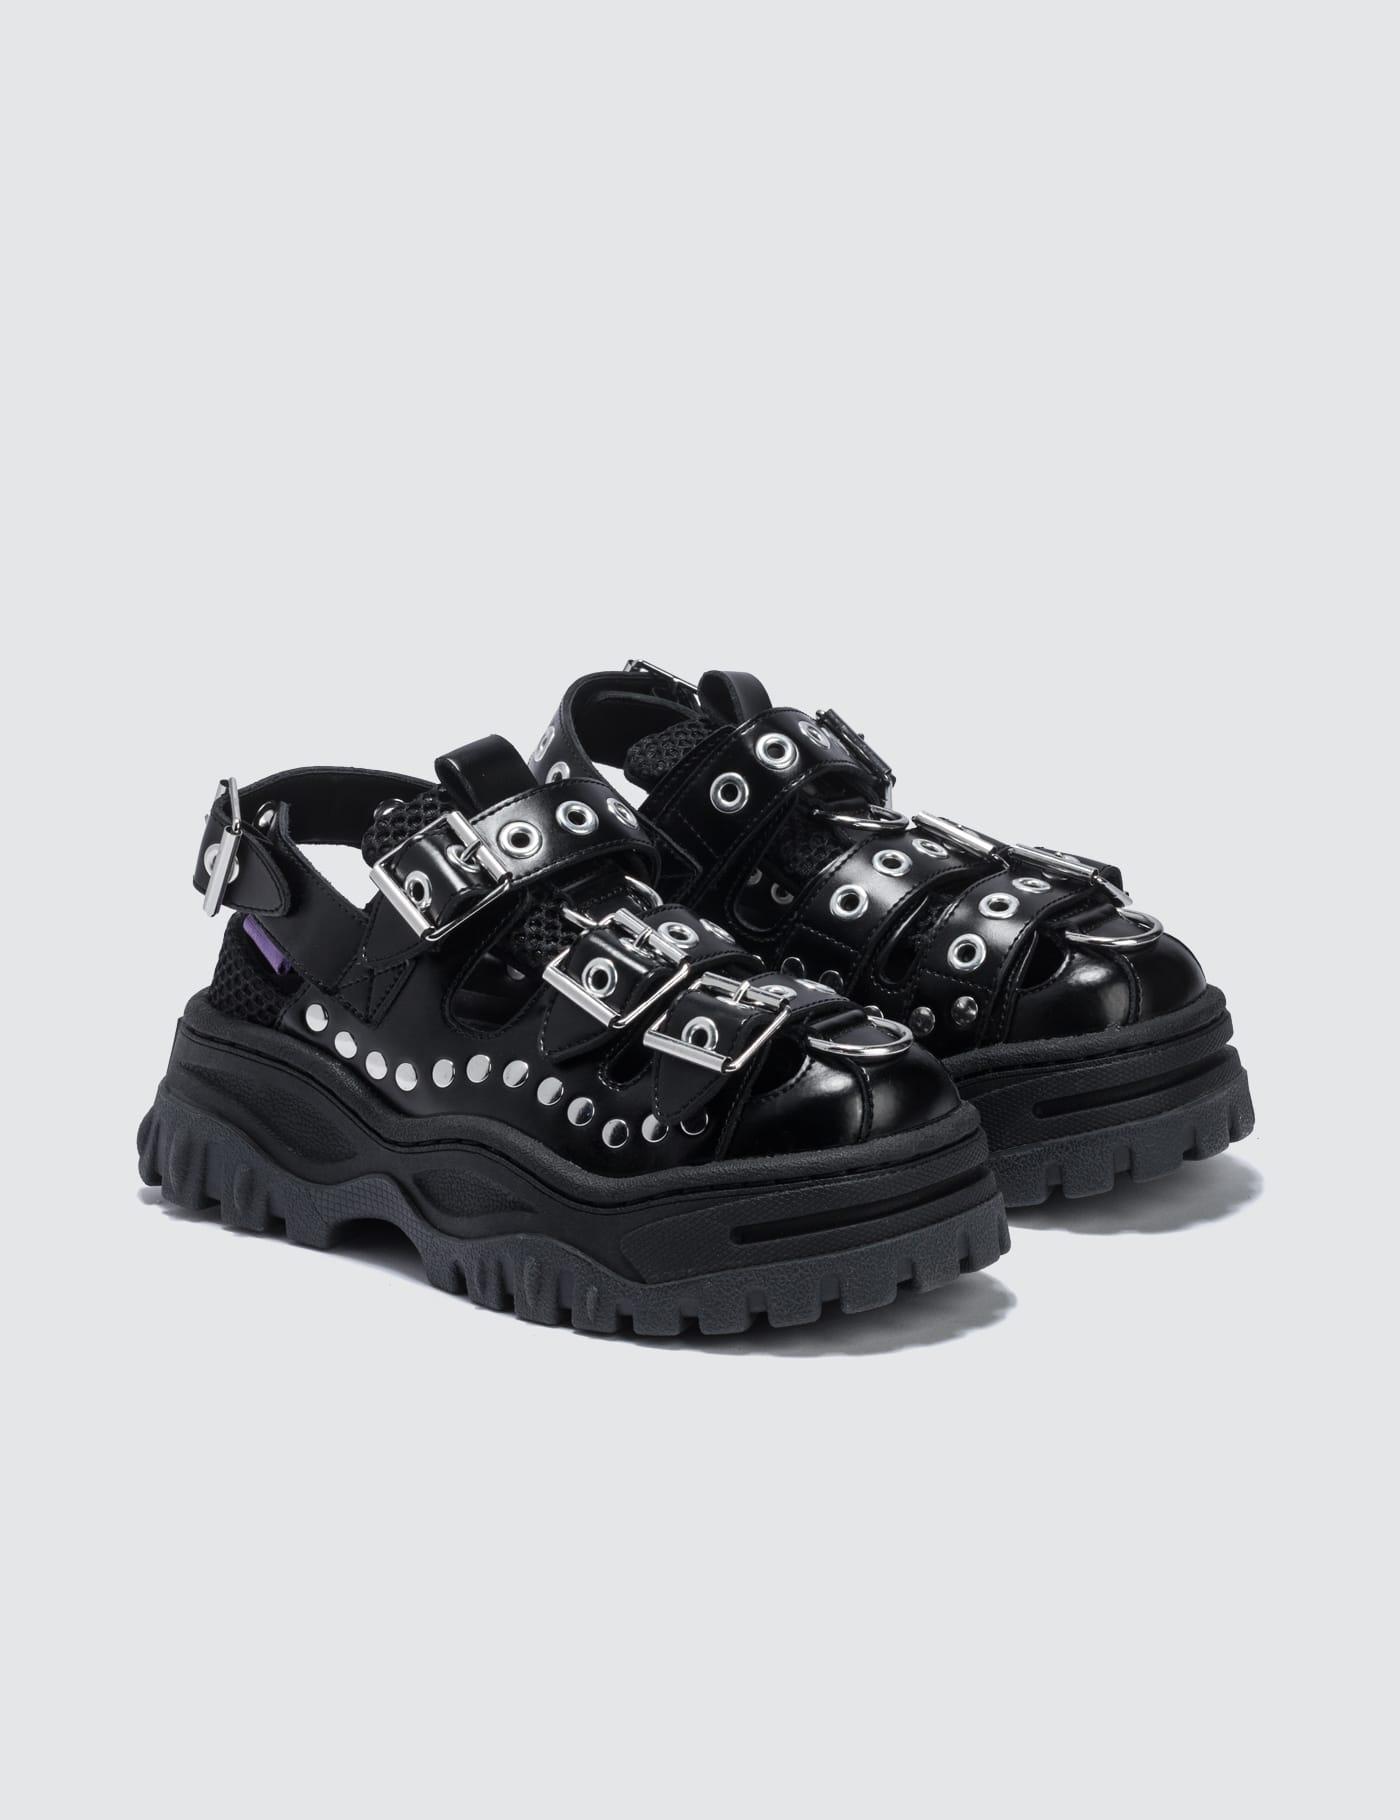 Eytys - Athena Leather Sandals | HBX